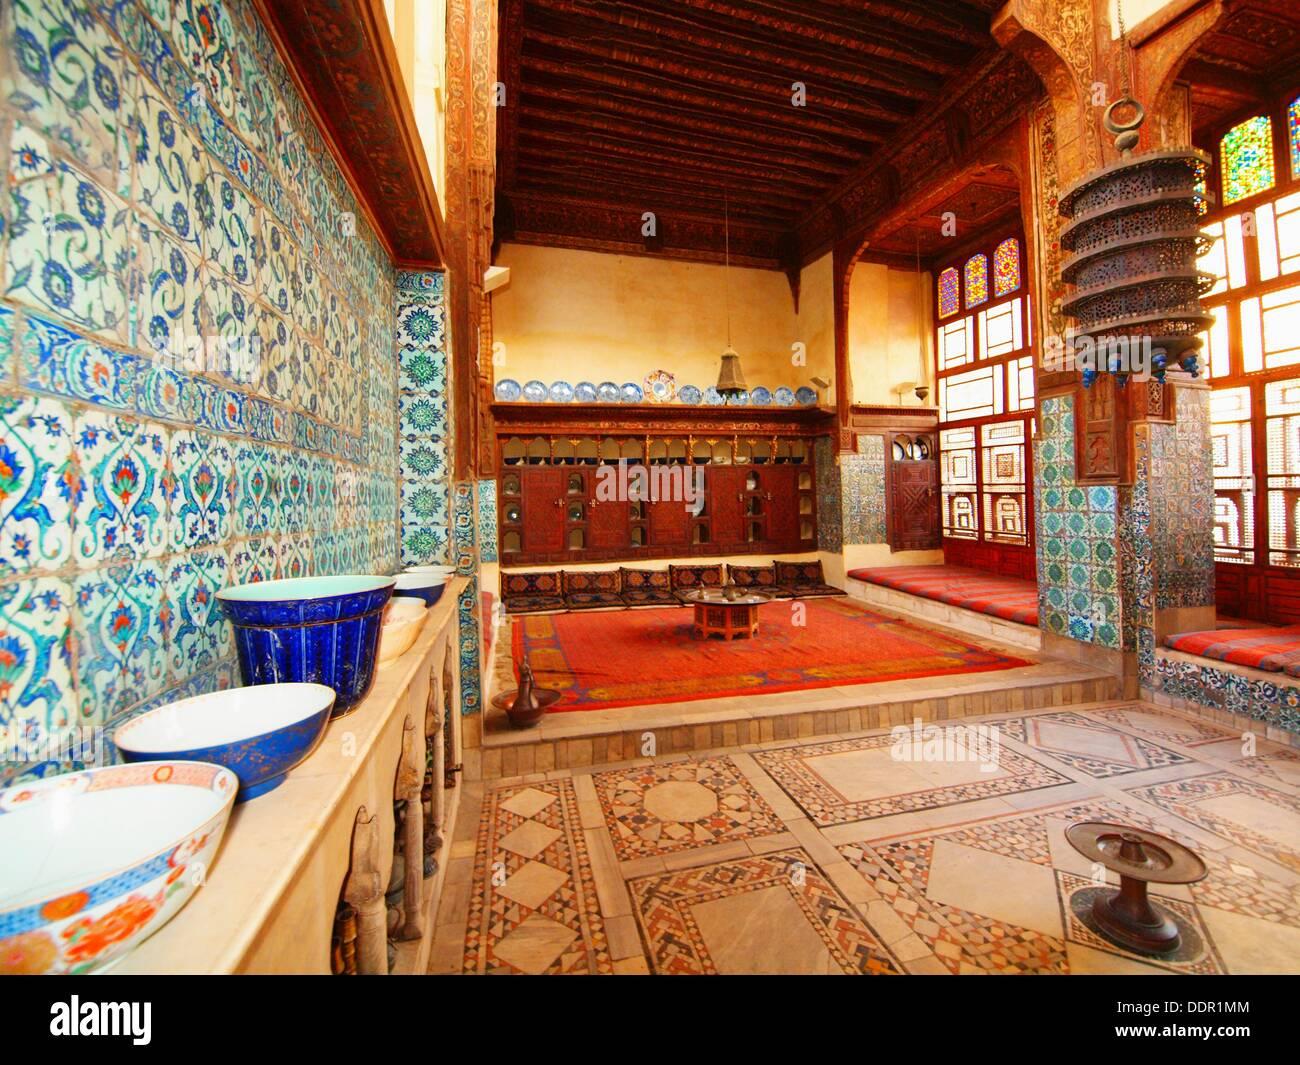 Wikala Sabil Kuttab Gamal al Din Al Dahabi, Cairo, Egypt - Stock Image